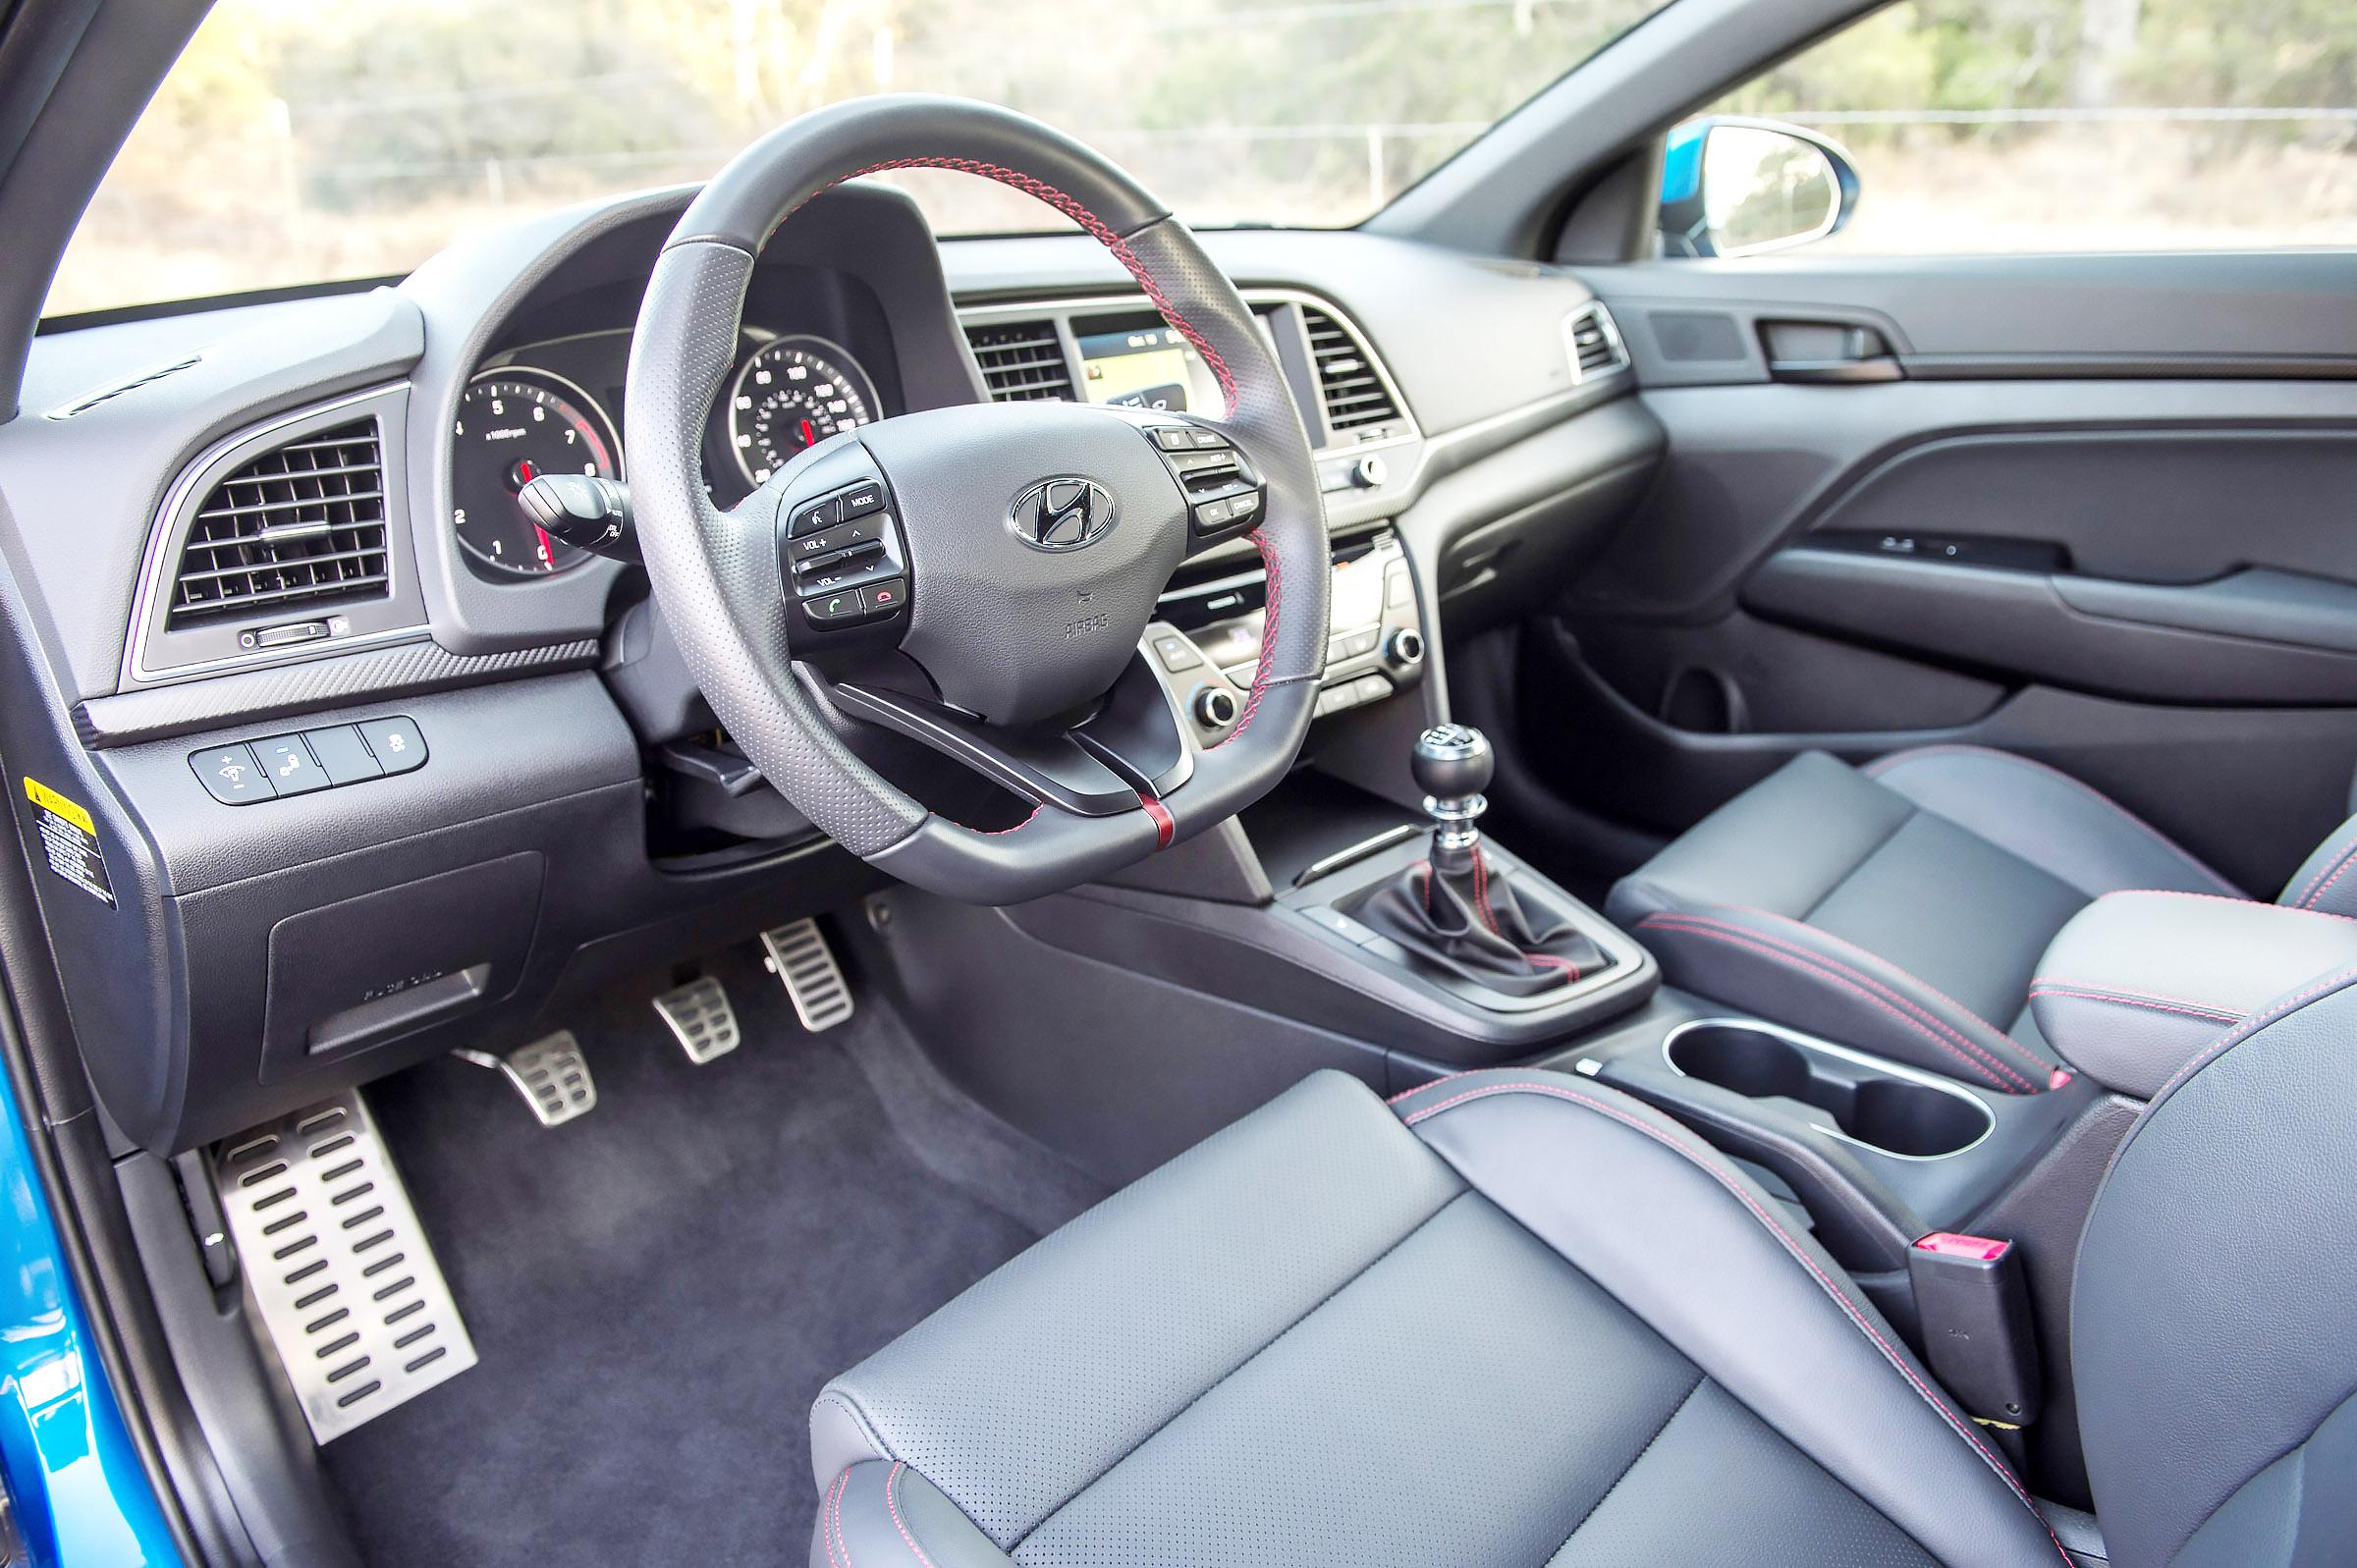 Driver 39 S Seat 2017 Hyundai Elantra Upgrades With Sporty Fun Pittsburgh Post Gazette